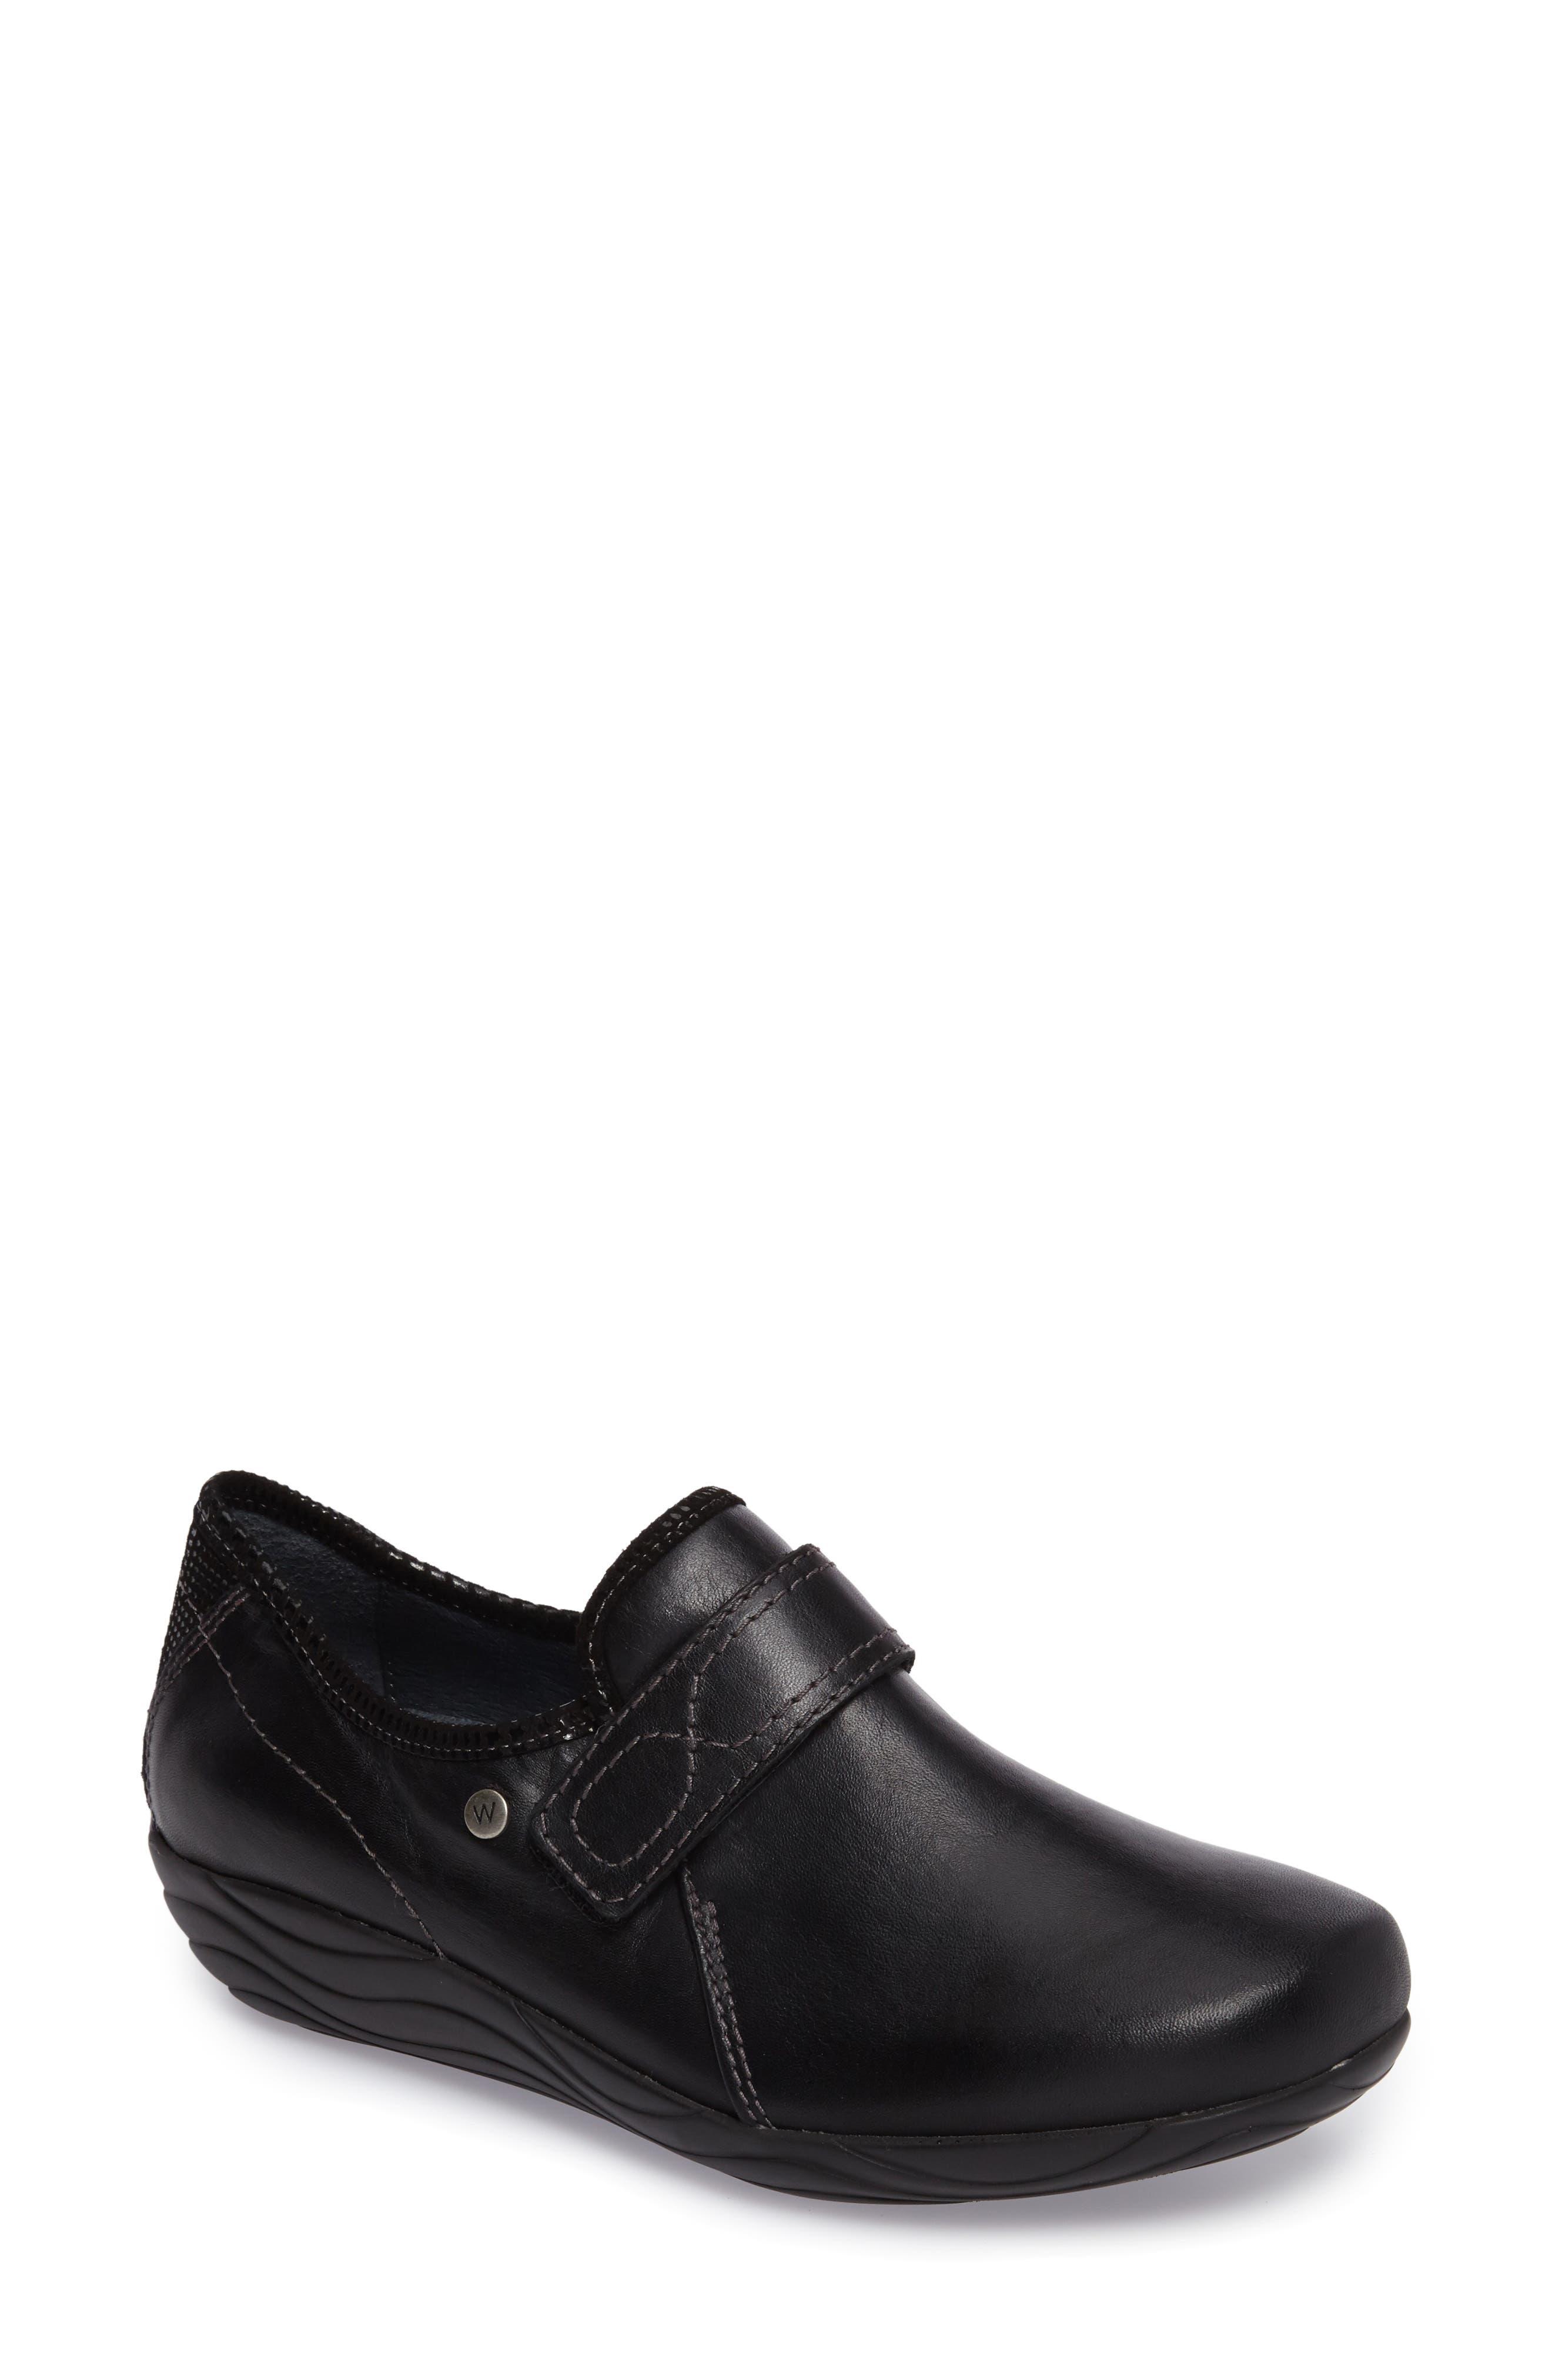 Desna Slip-On Sneaker,                             Main thumbnail 1, color,                             001